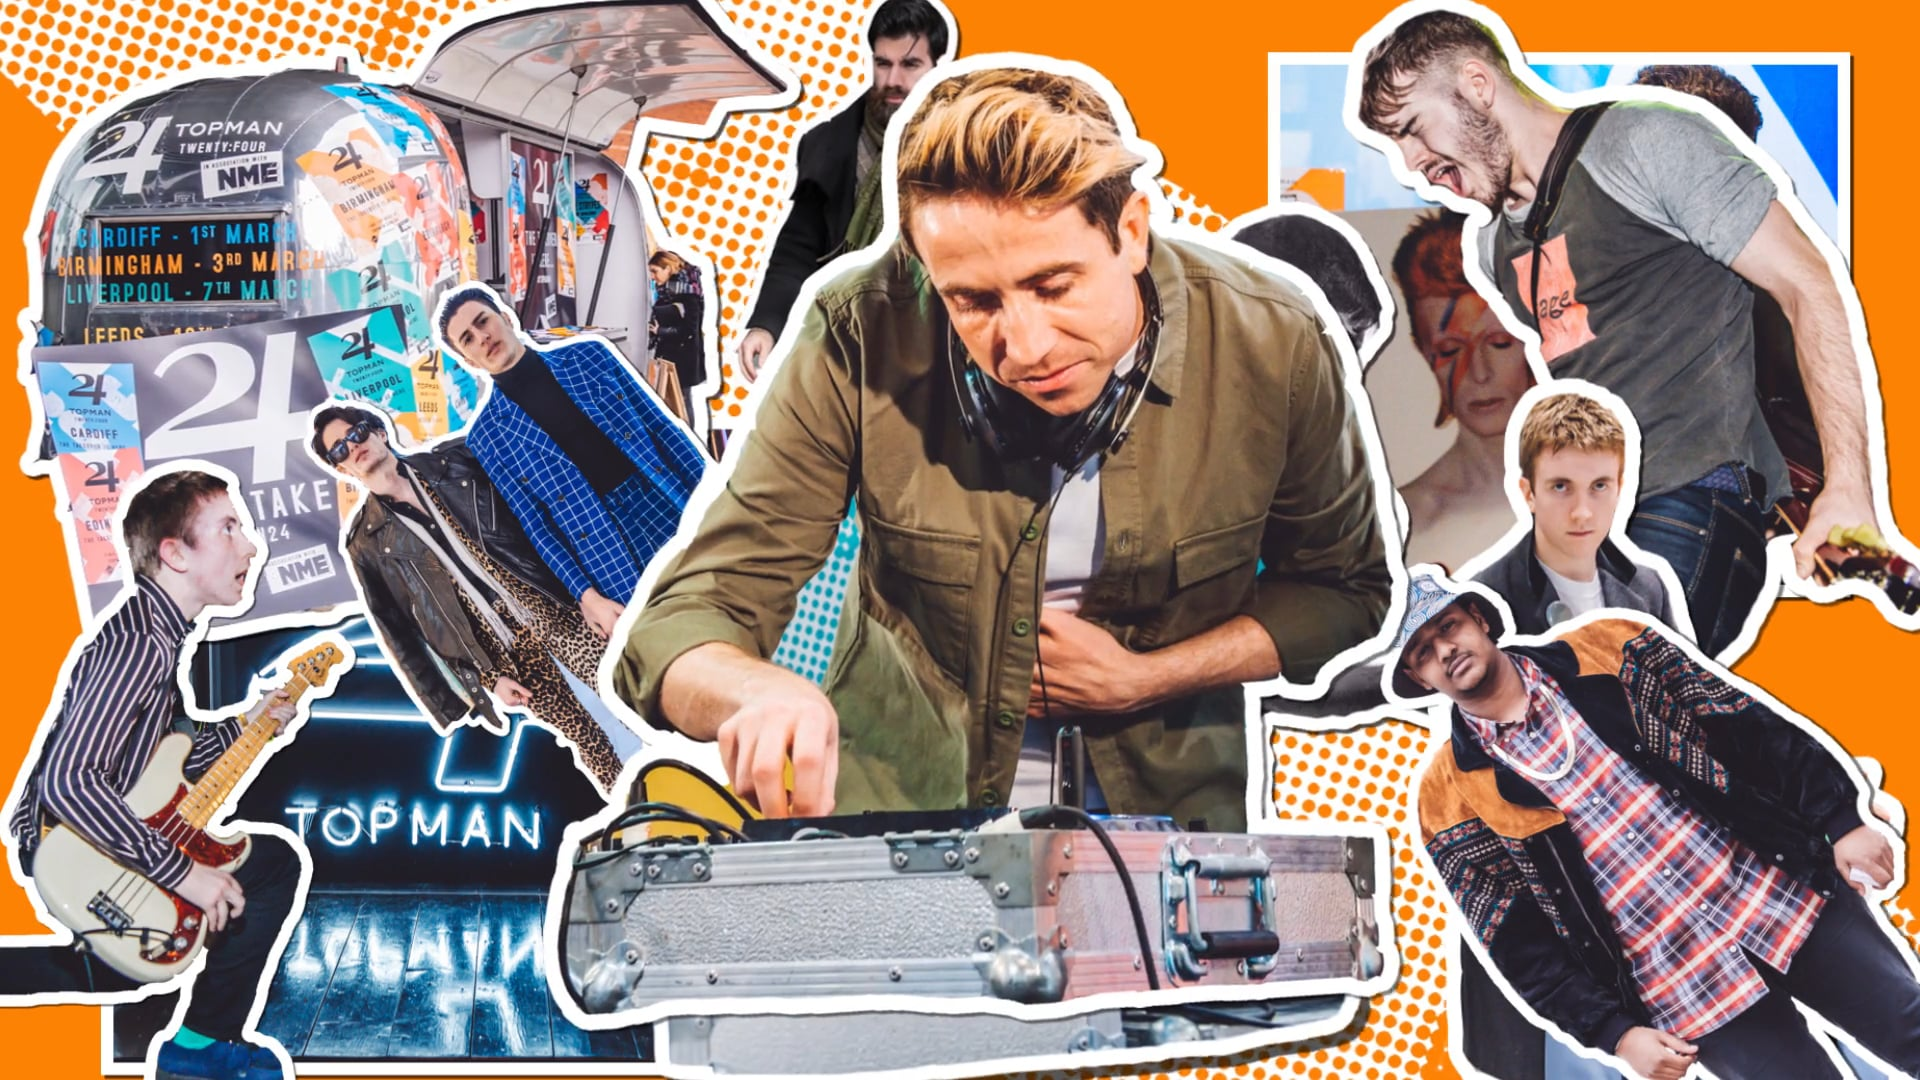 Topman | TM24 Tour Highlights